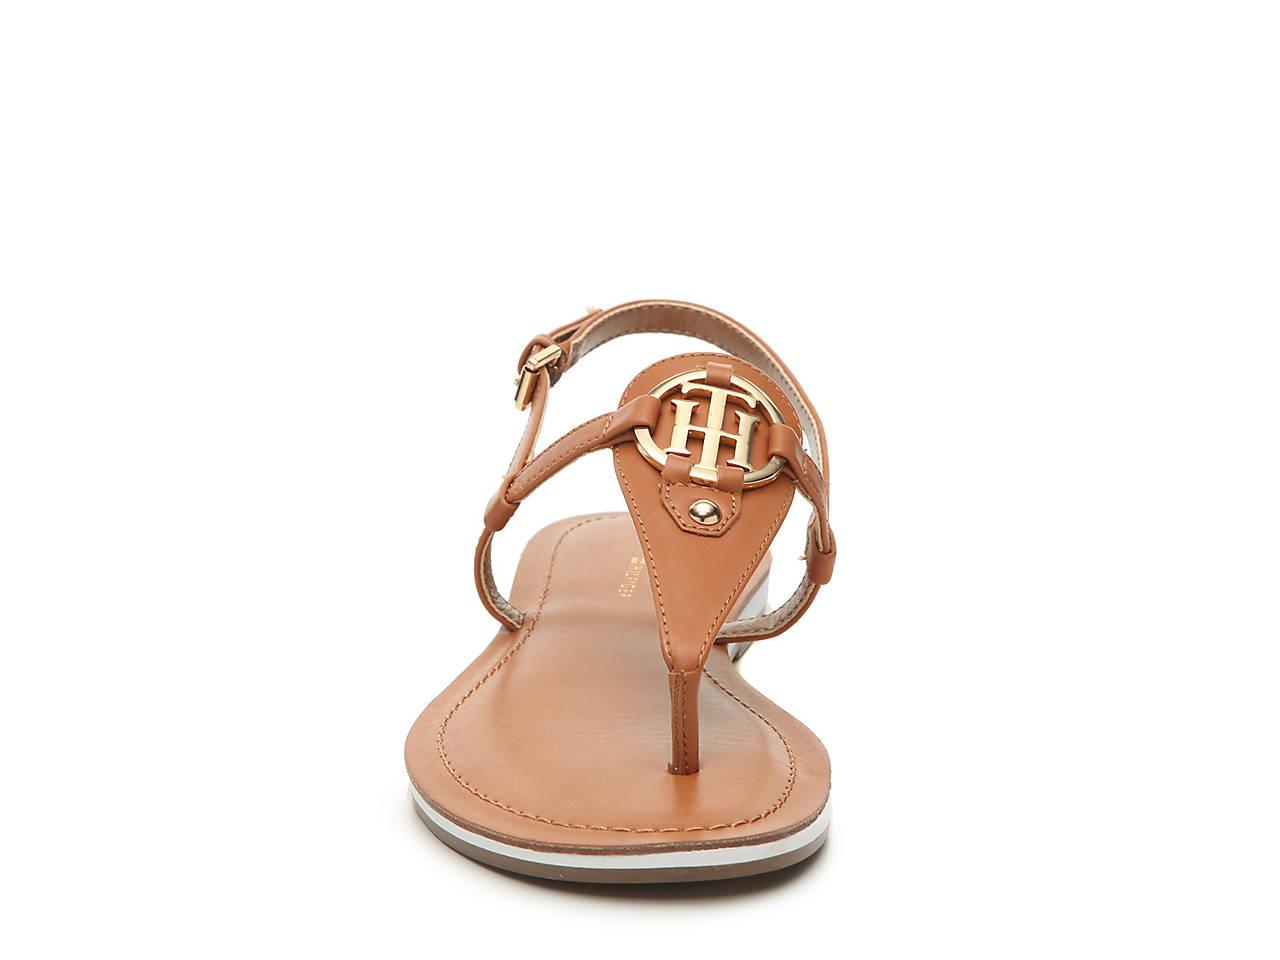 skate shoes best online outlet store Tommy Hilfiger Genei Sandal Women's Shoes | DSW